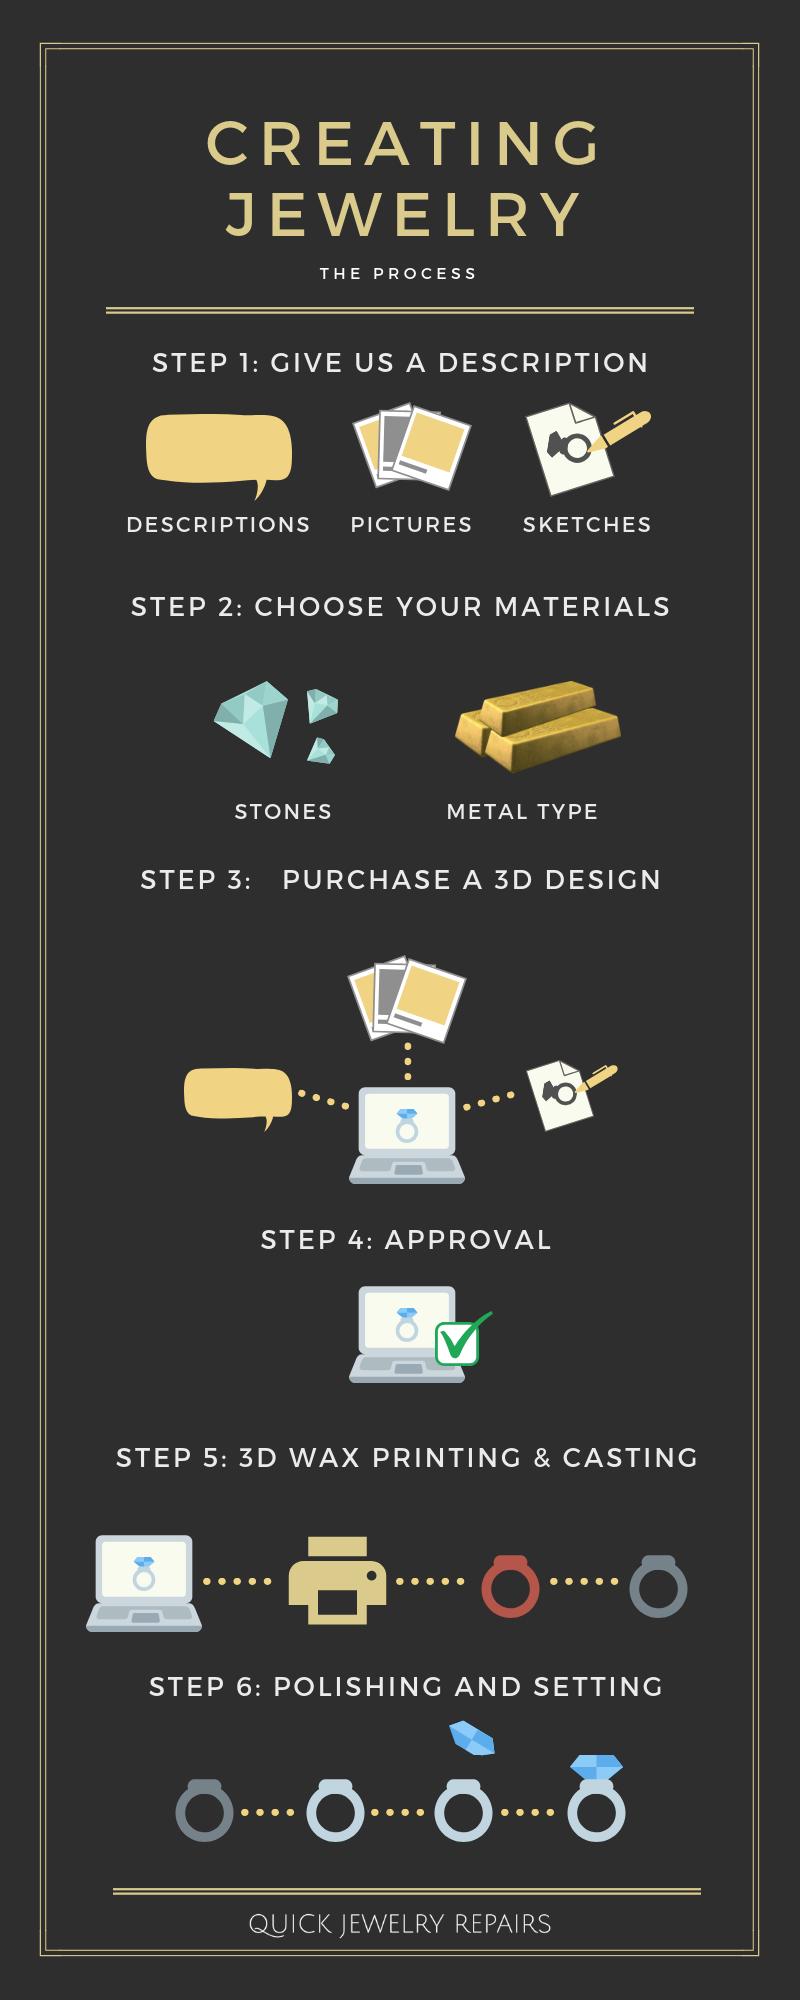 custom-jewelry-creation-infographic